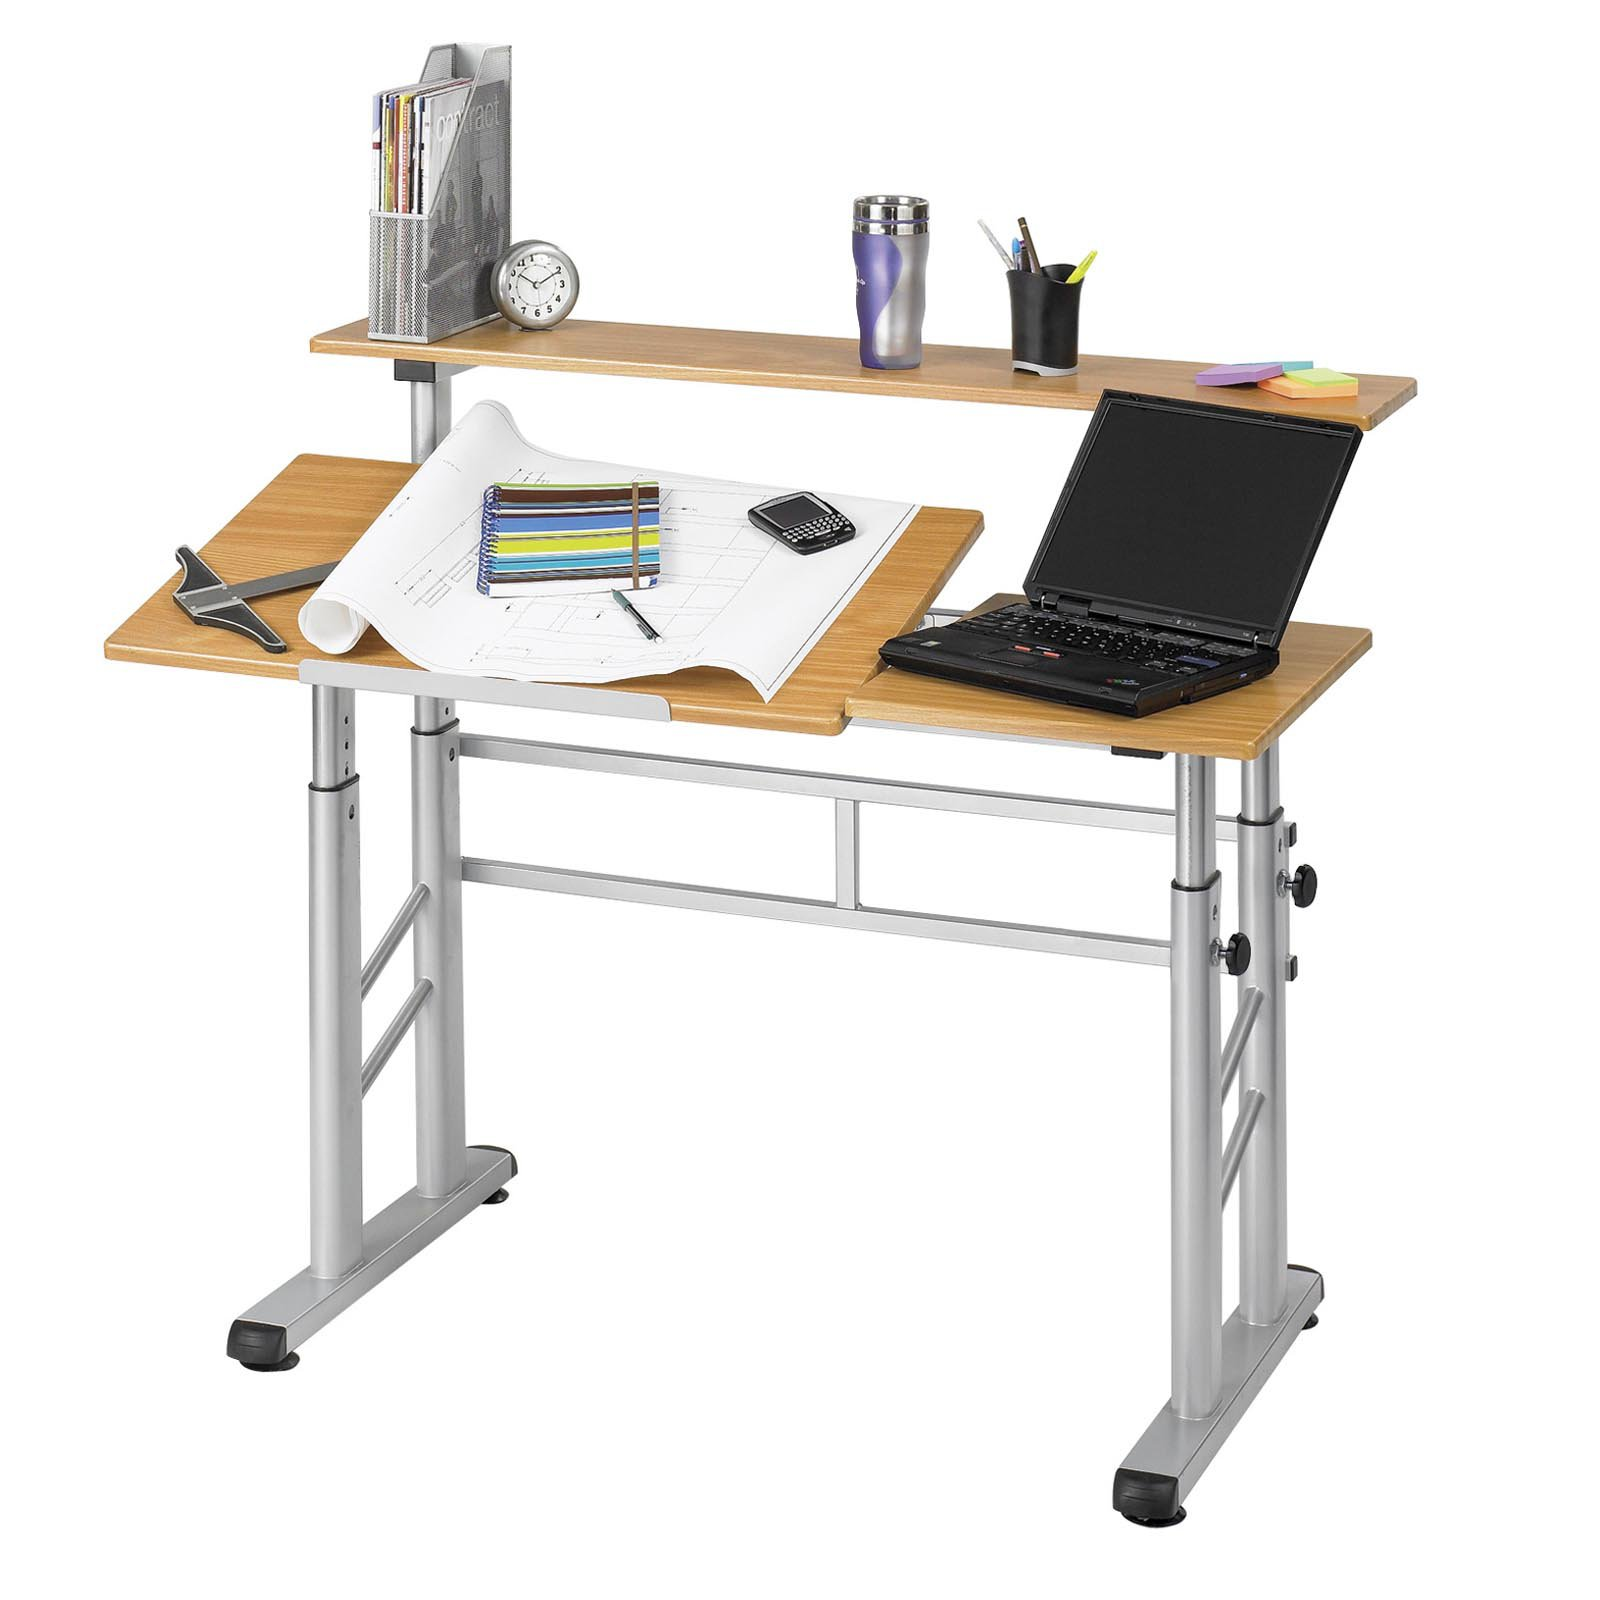 Safco Adjustable Split-Level Drafting Table - Walmart.com